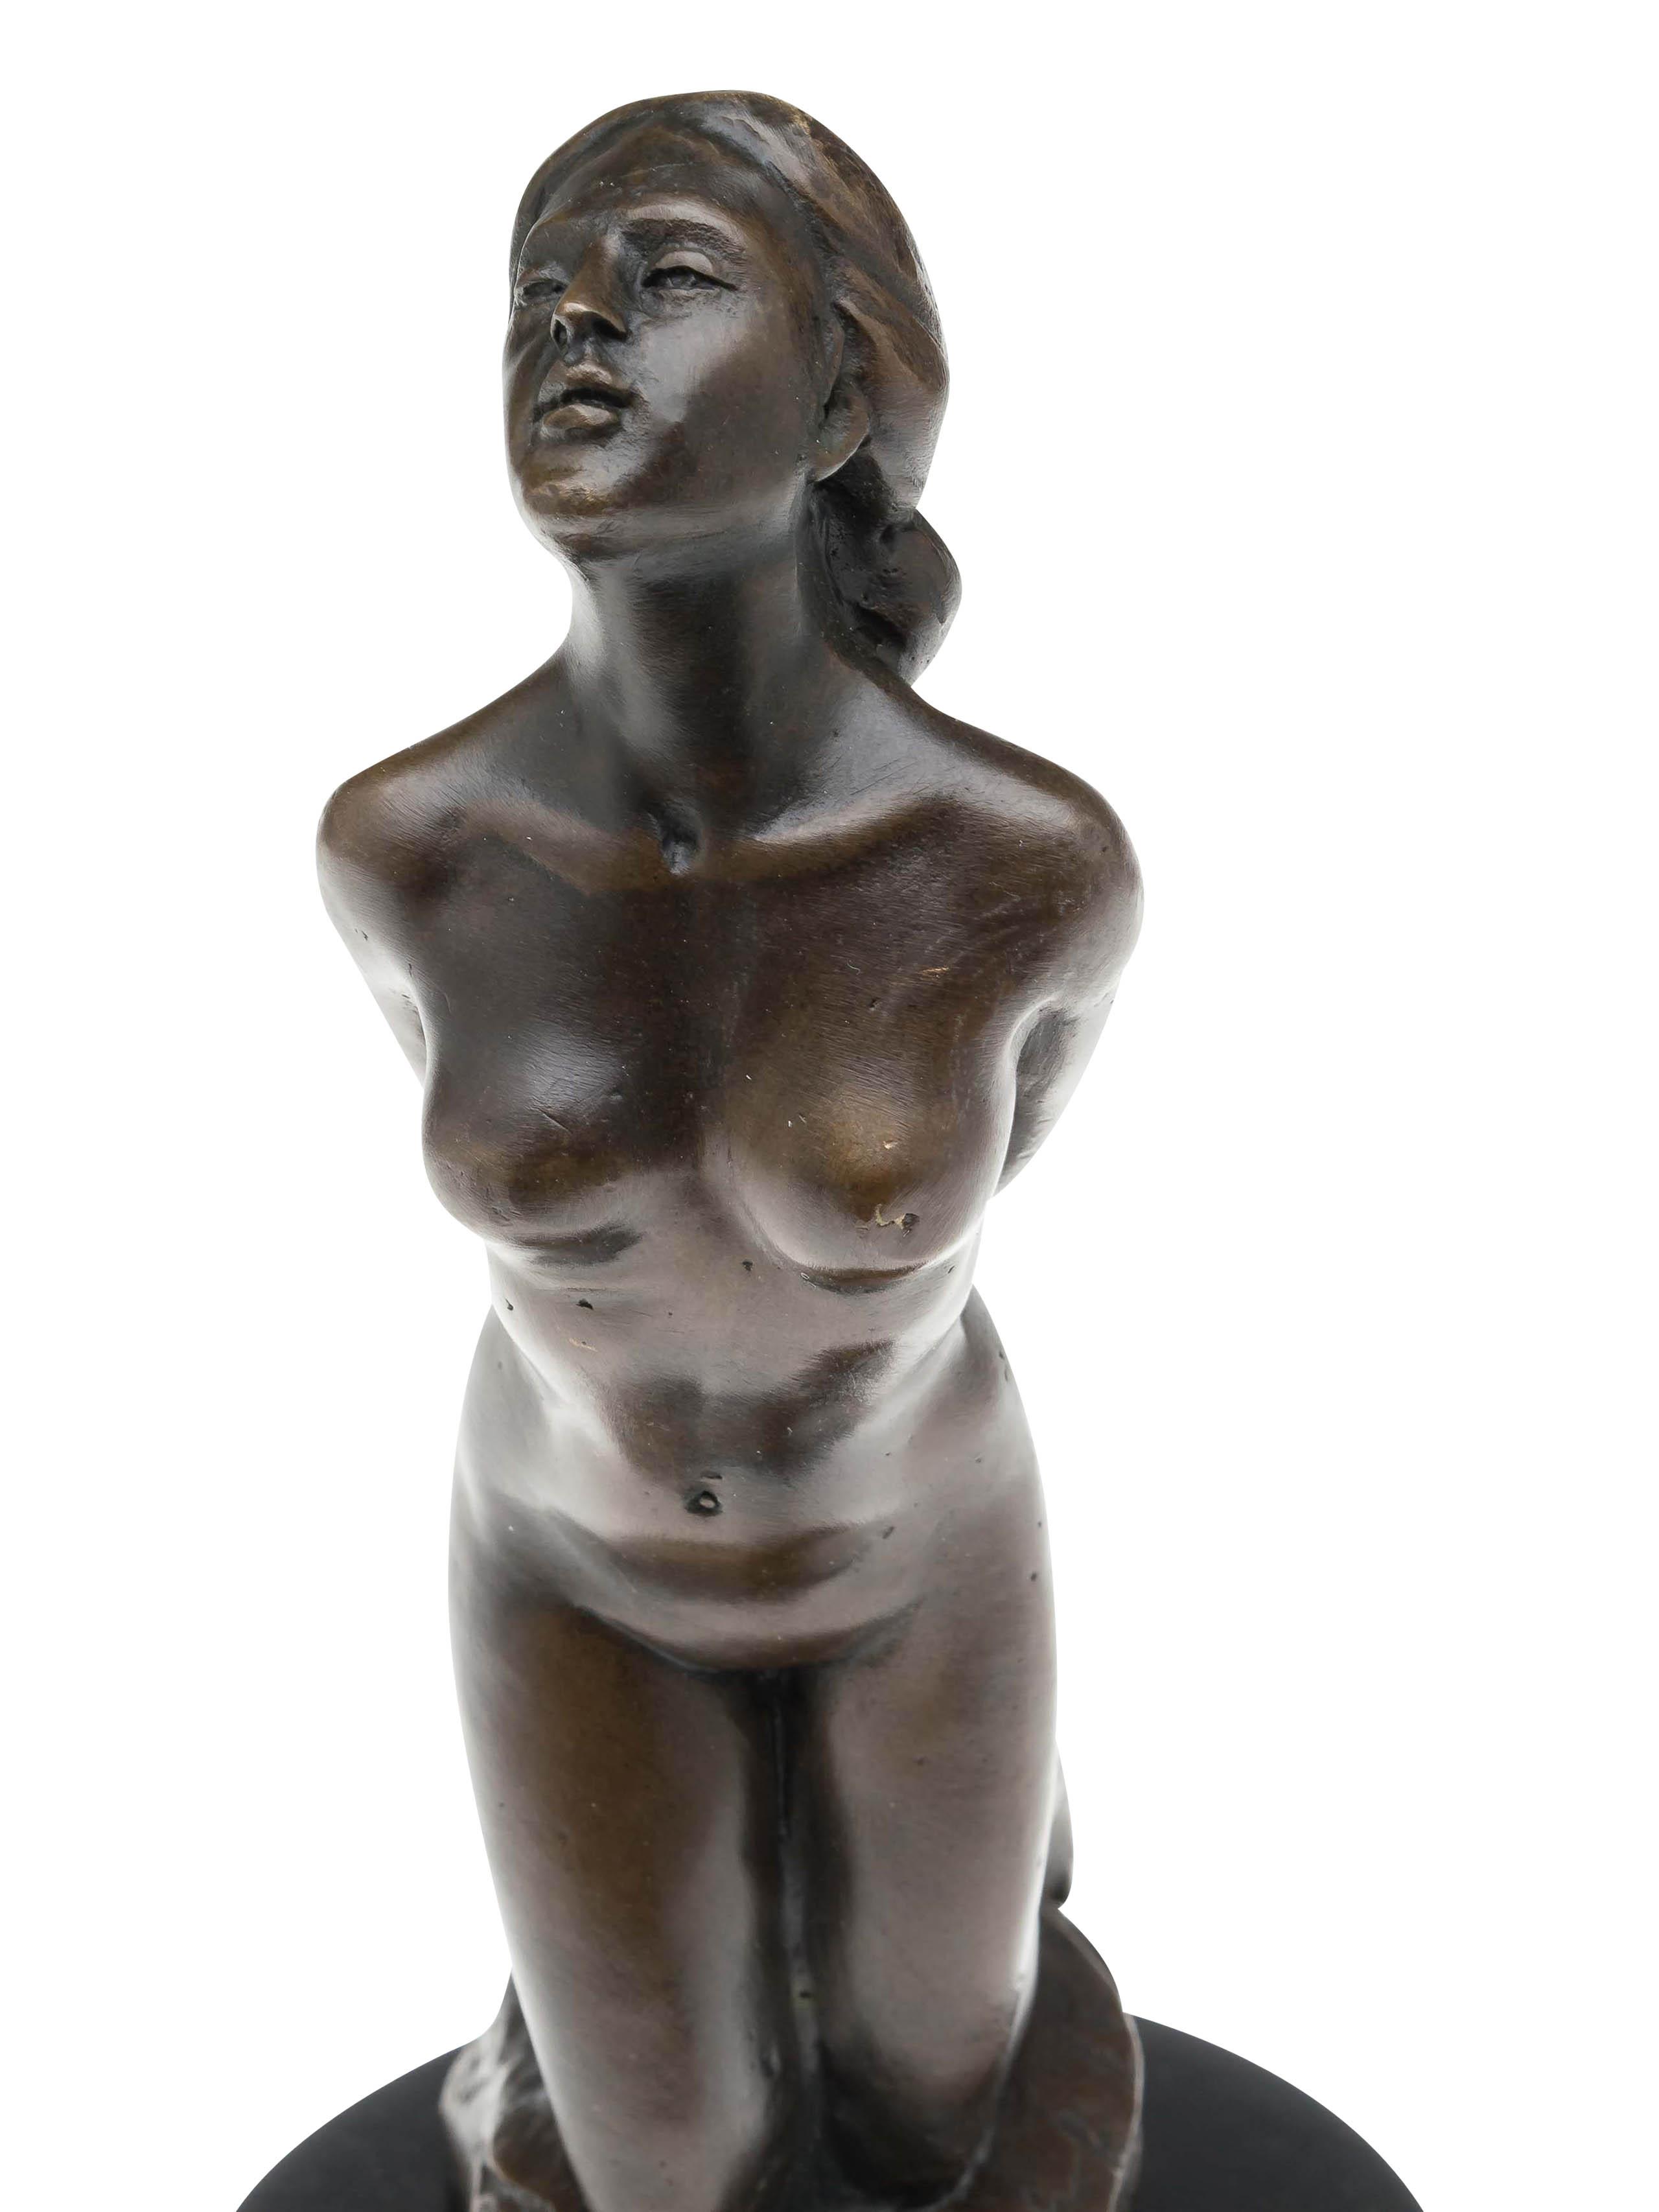 Brąz Przedmioty z metalu Bronzeskulptur Frau Erotik kniende Bronzefigur Bronze Figur Antik-Stil Nude